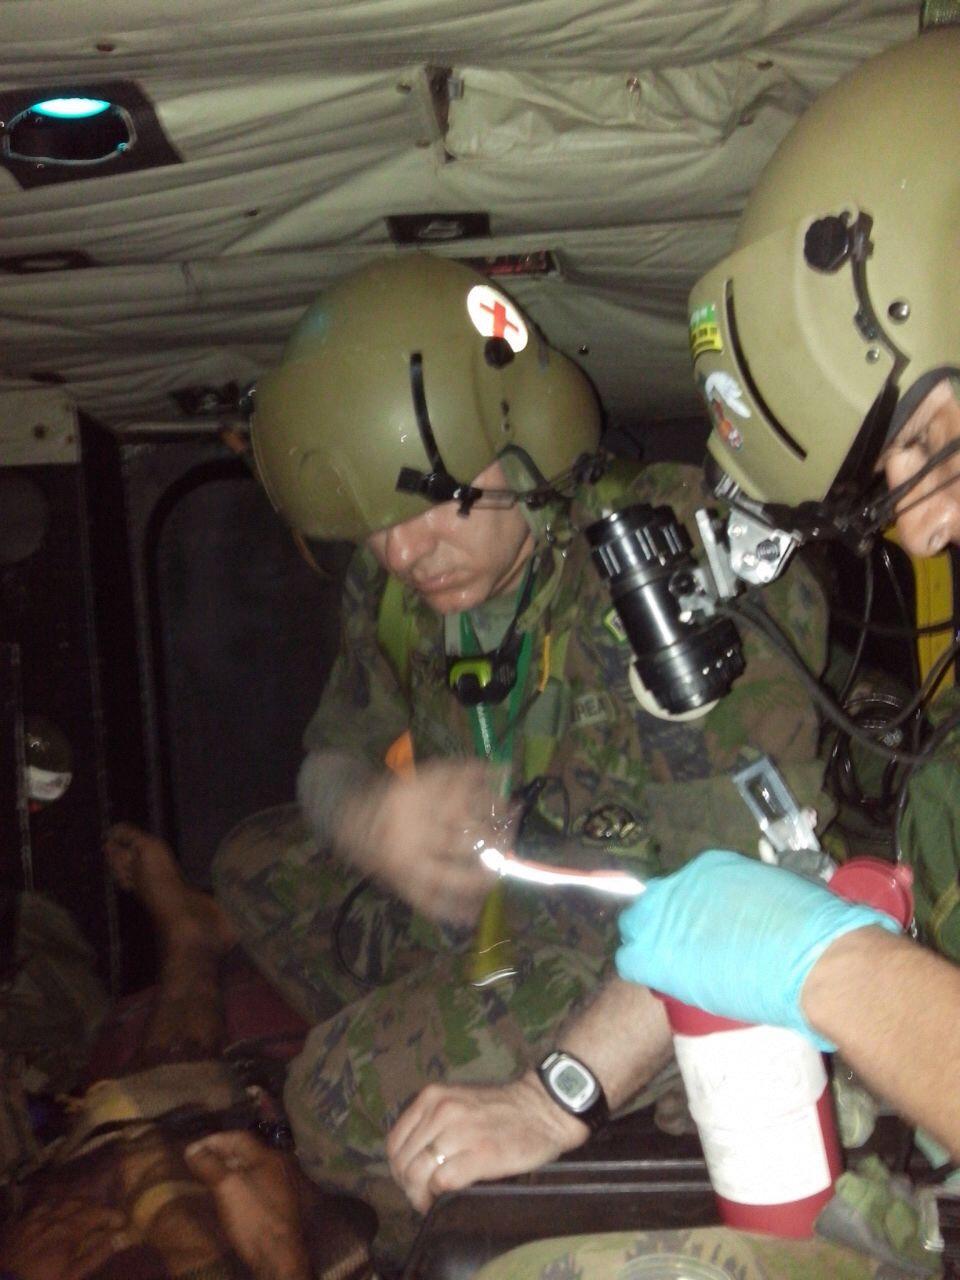 Médico militar atende a bordo do helicóptero  Sgt Johnson Barros / Agência Força Aérea